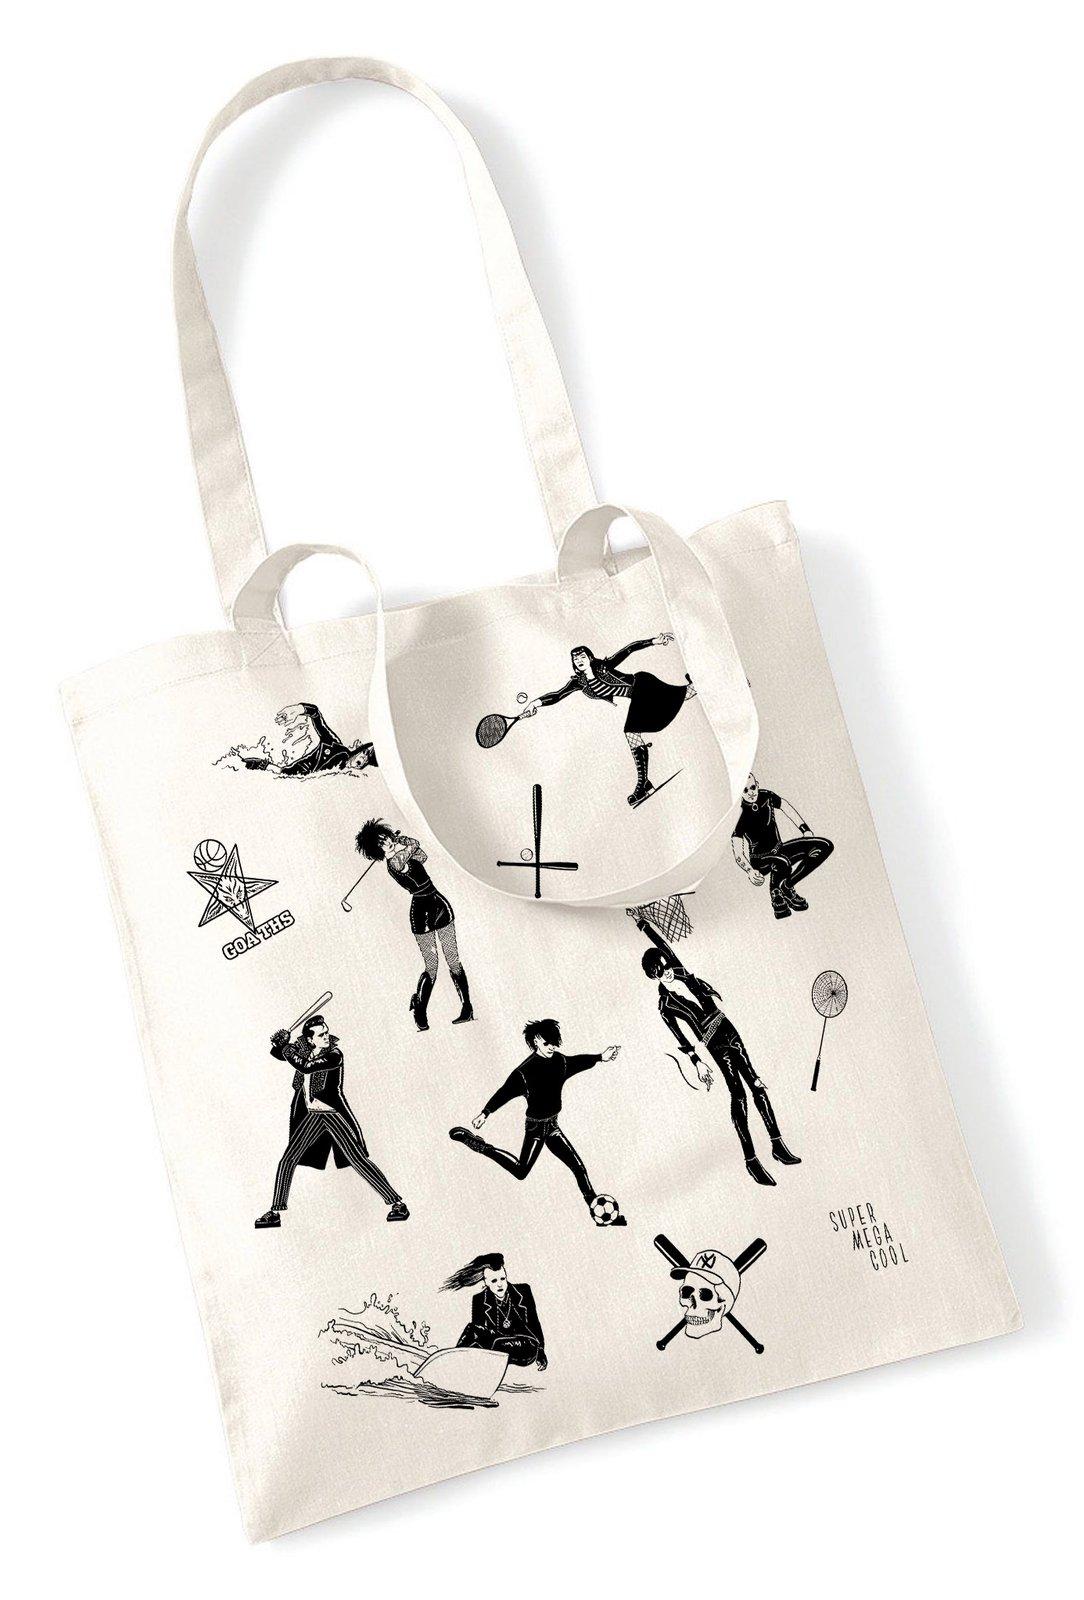 Cool Super Mega Bag Le Sportif Goth Shopping — 77w5Unpq8